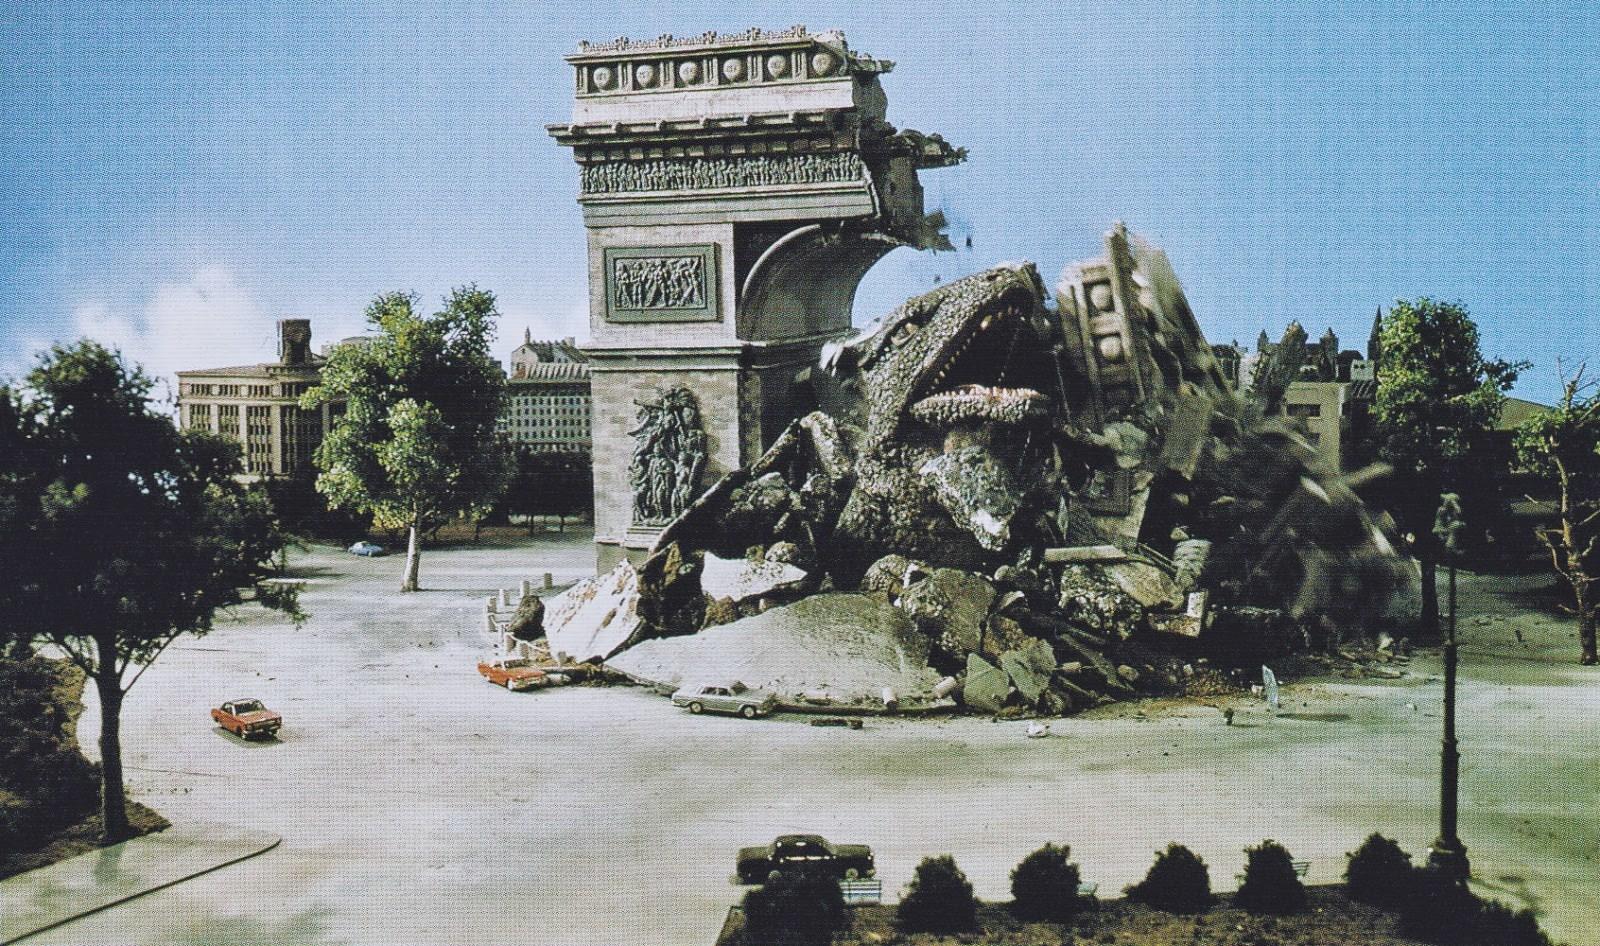 Gorosaurus burrows into Paris